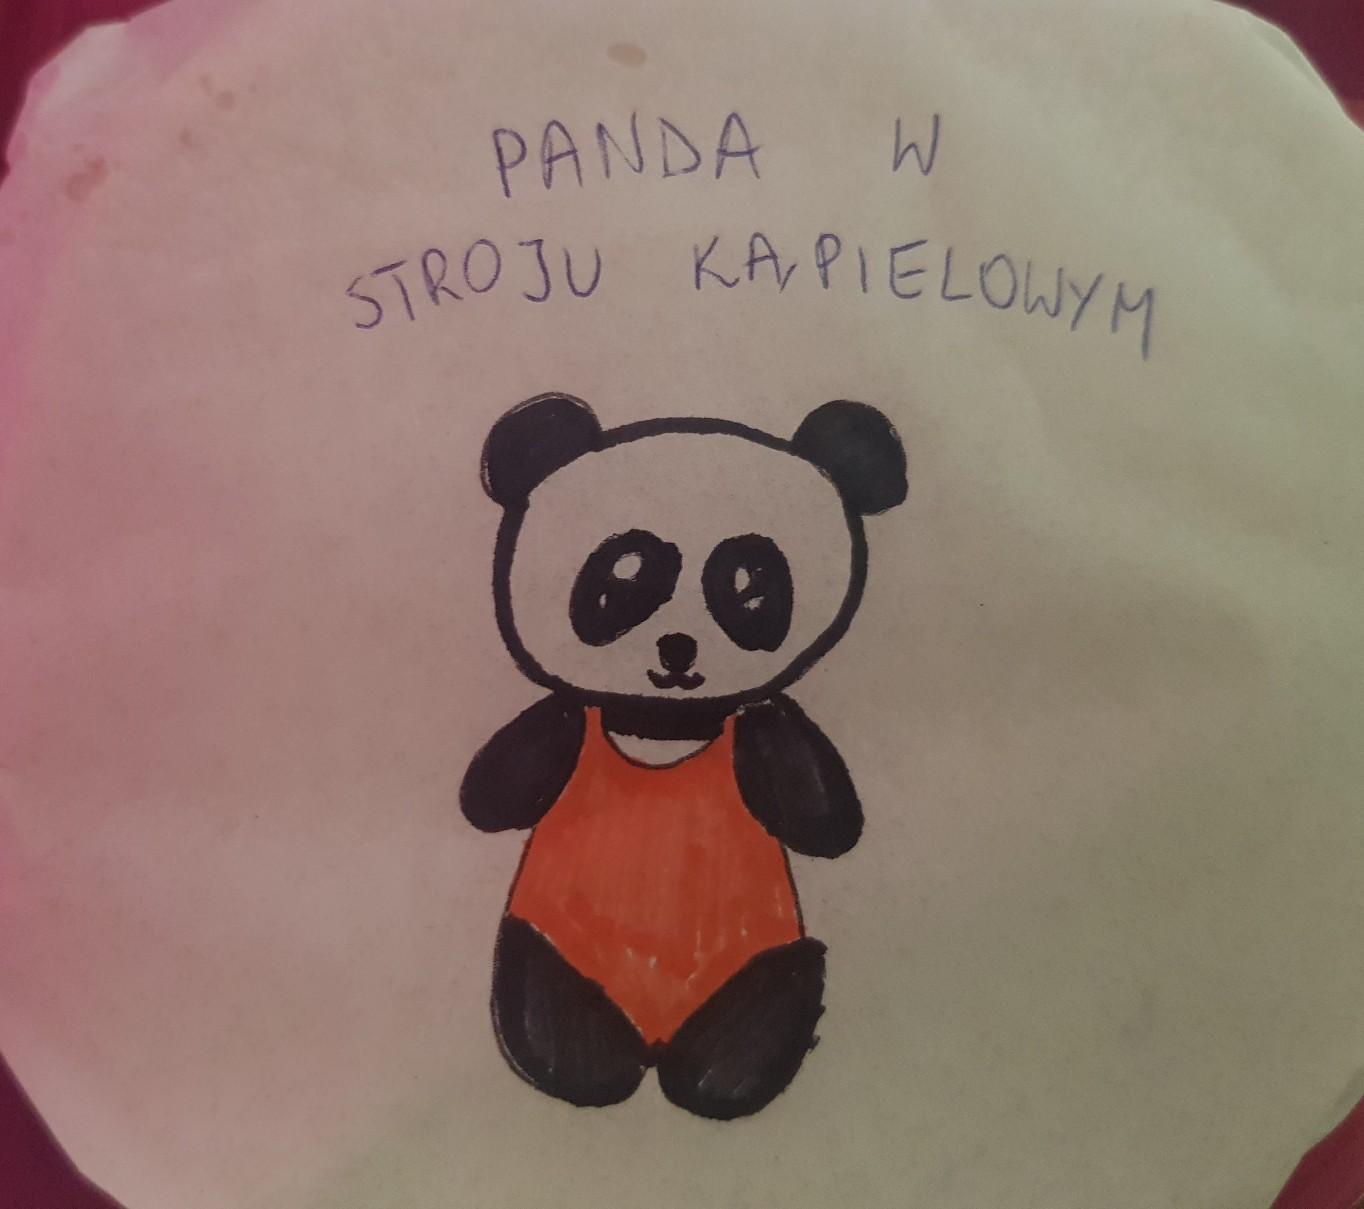 lunchbox art panda bathing suit